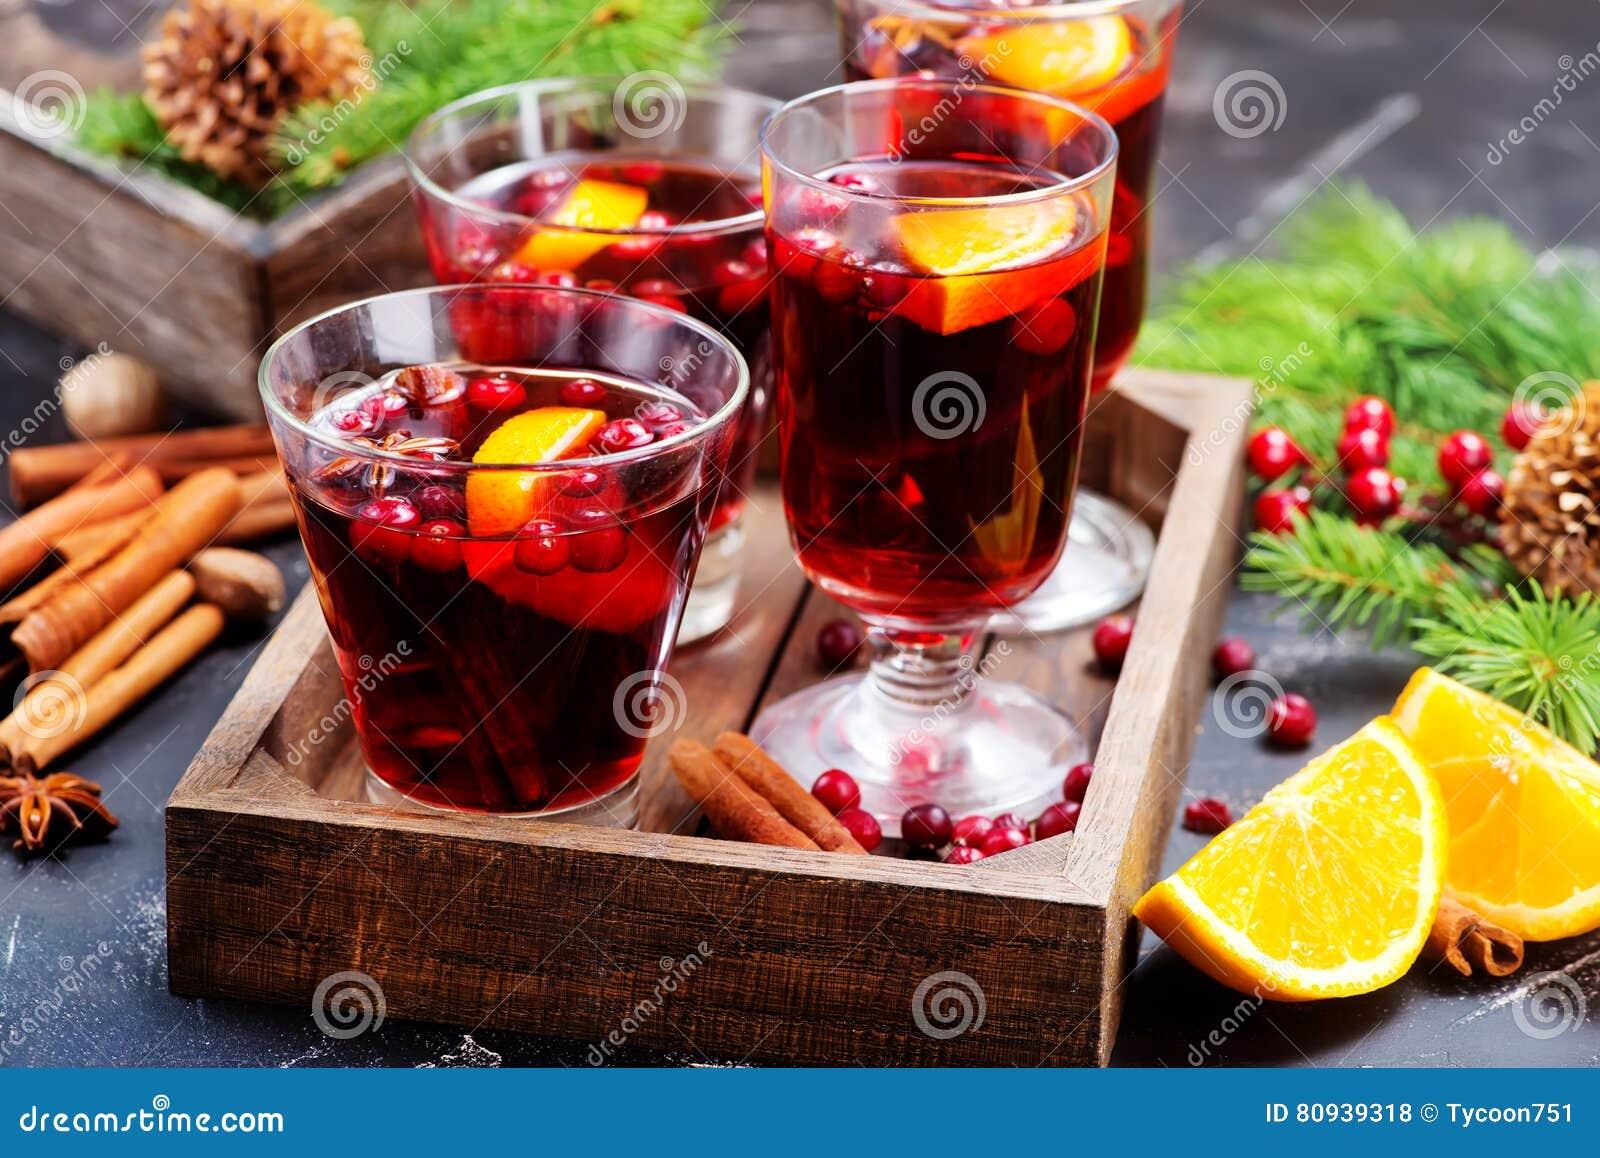 Download 圣诞节饮料 库存照片. 图片 包括有 食物, 装饰, 冷杉, 蔓越桔, 果子, 橙色, 香橼, 打孔机, 打赌的人 - 80939318